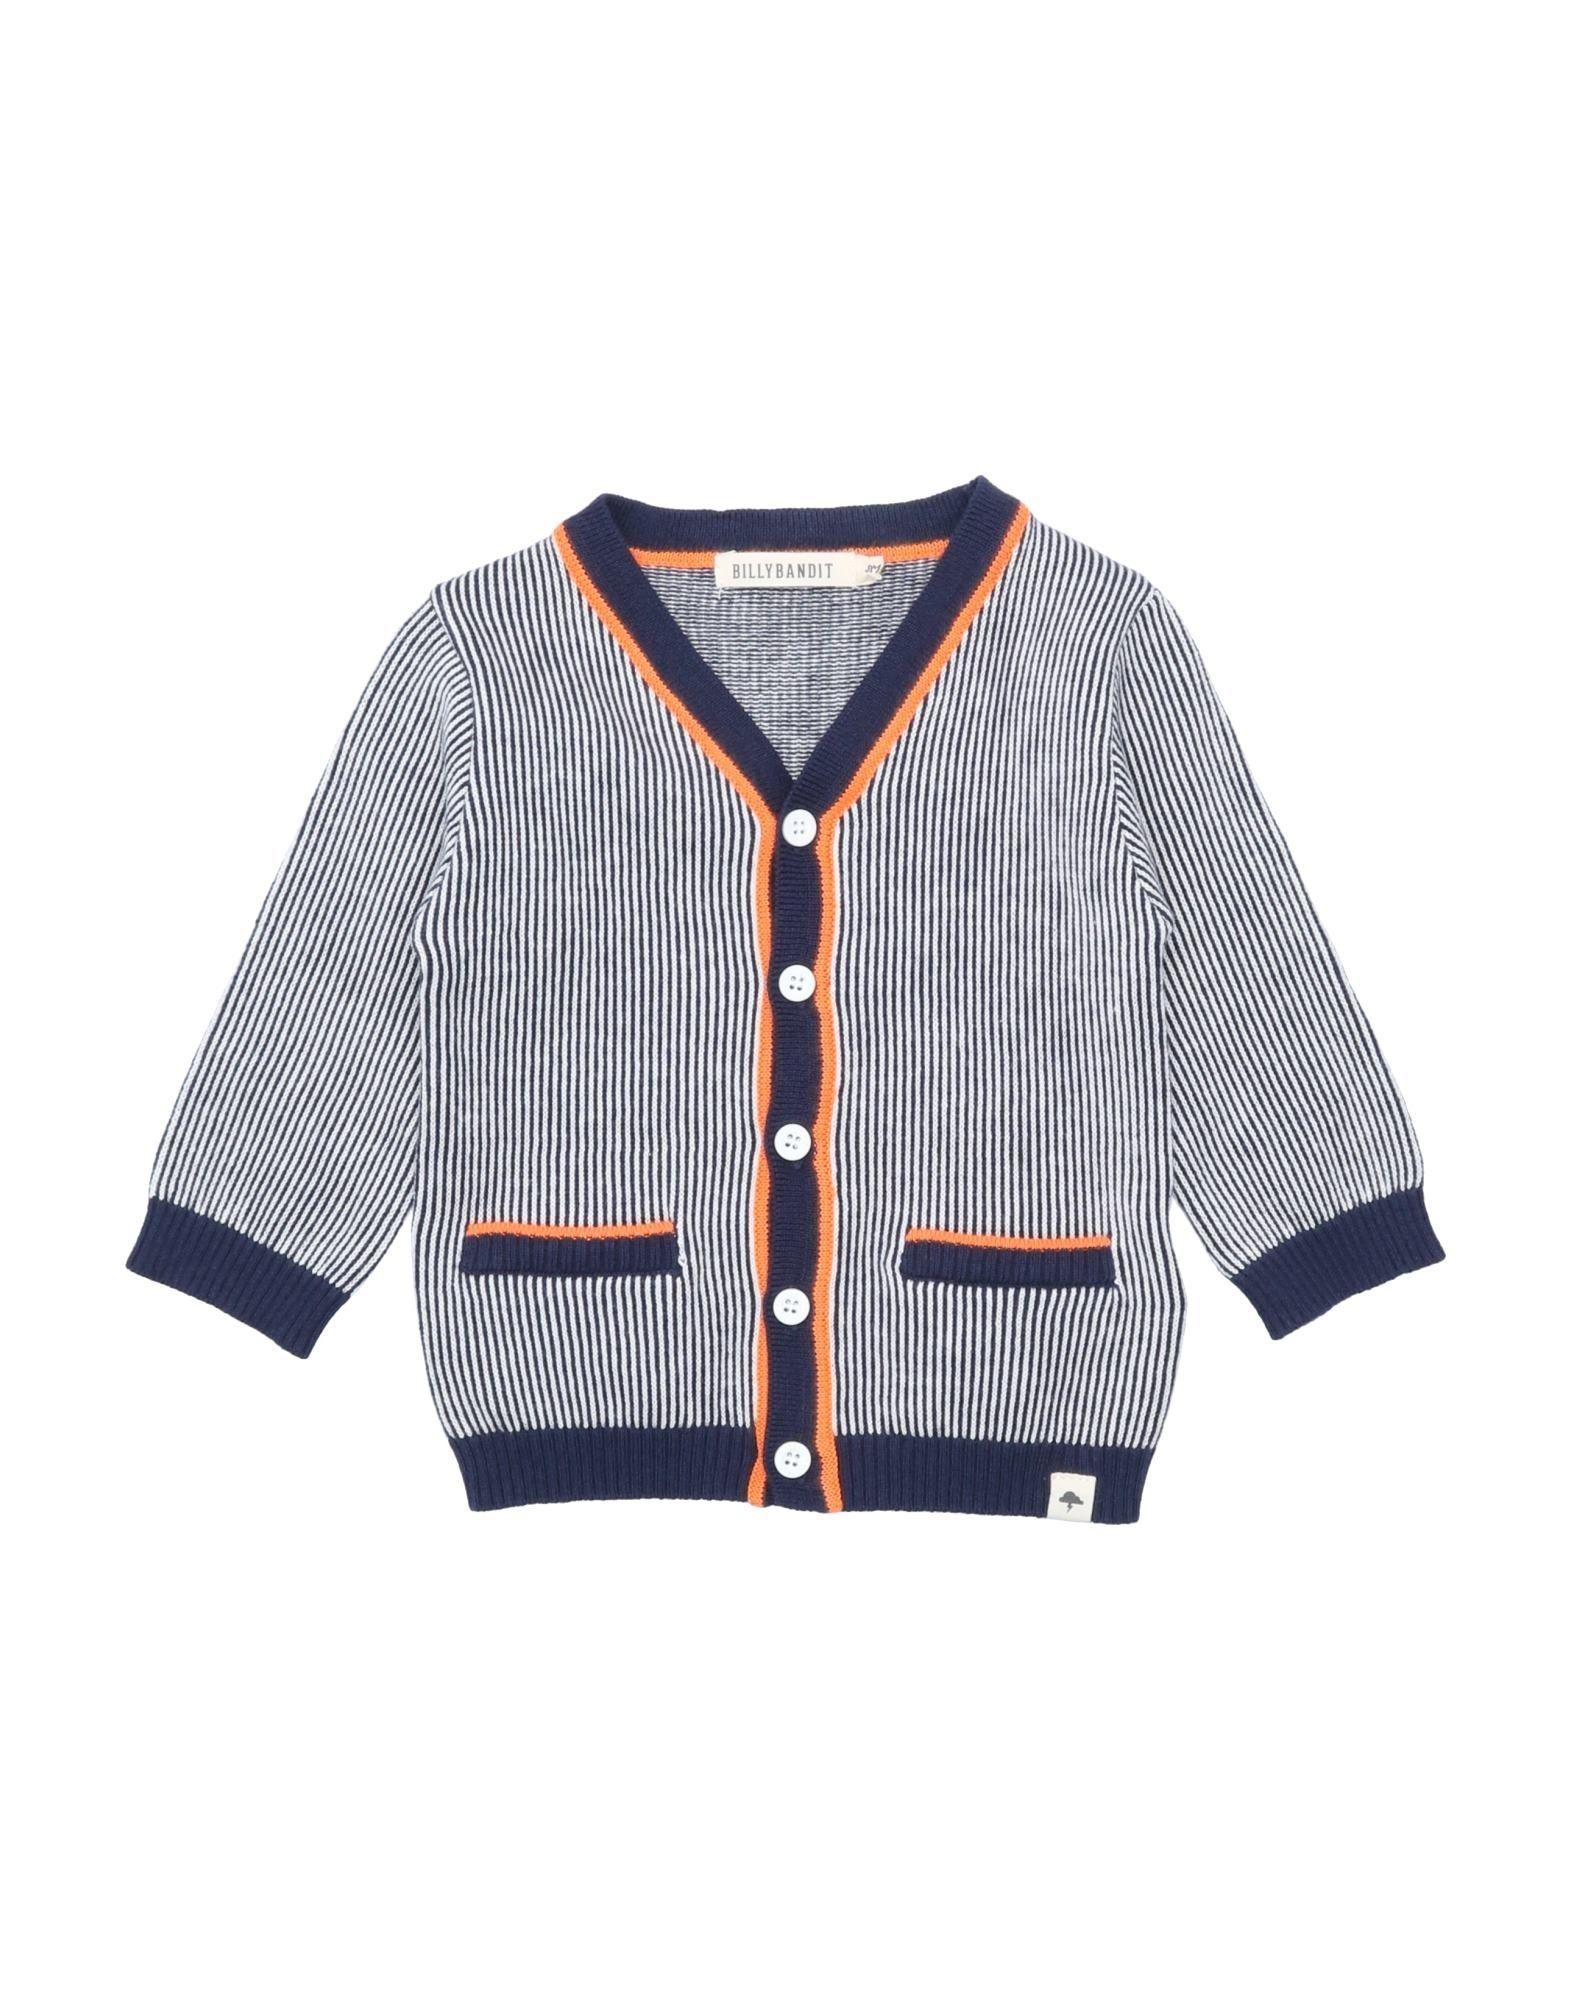 2ea9e2e5d0d2 Cardigan neonato 0-24 mesi bambino - abbigliamento Bambino su YOOX